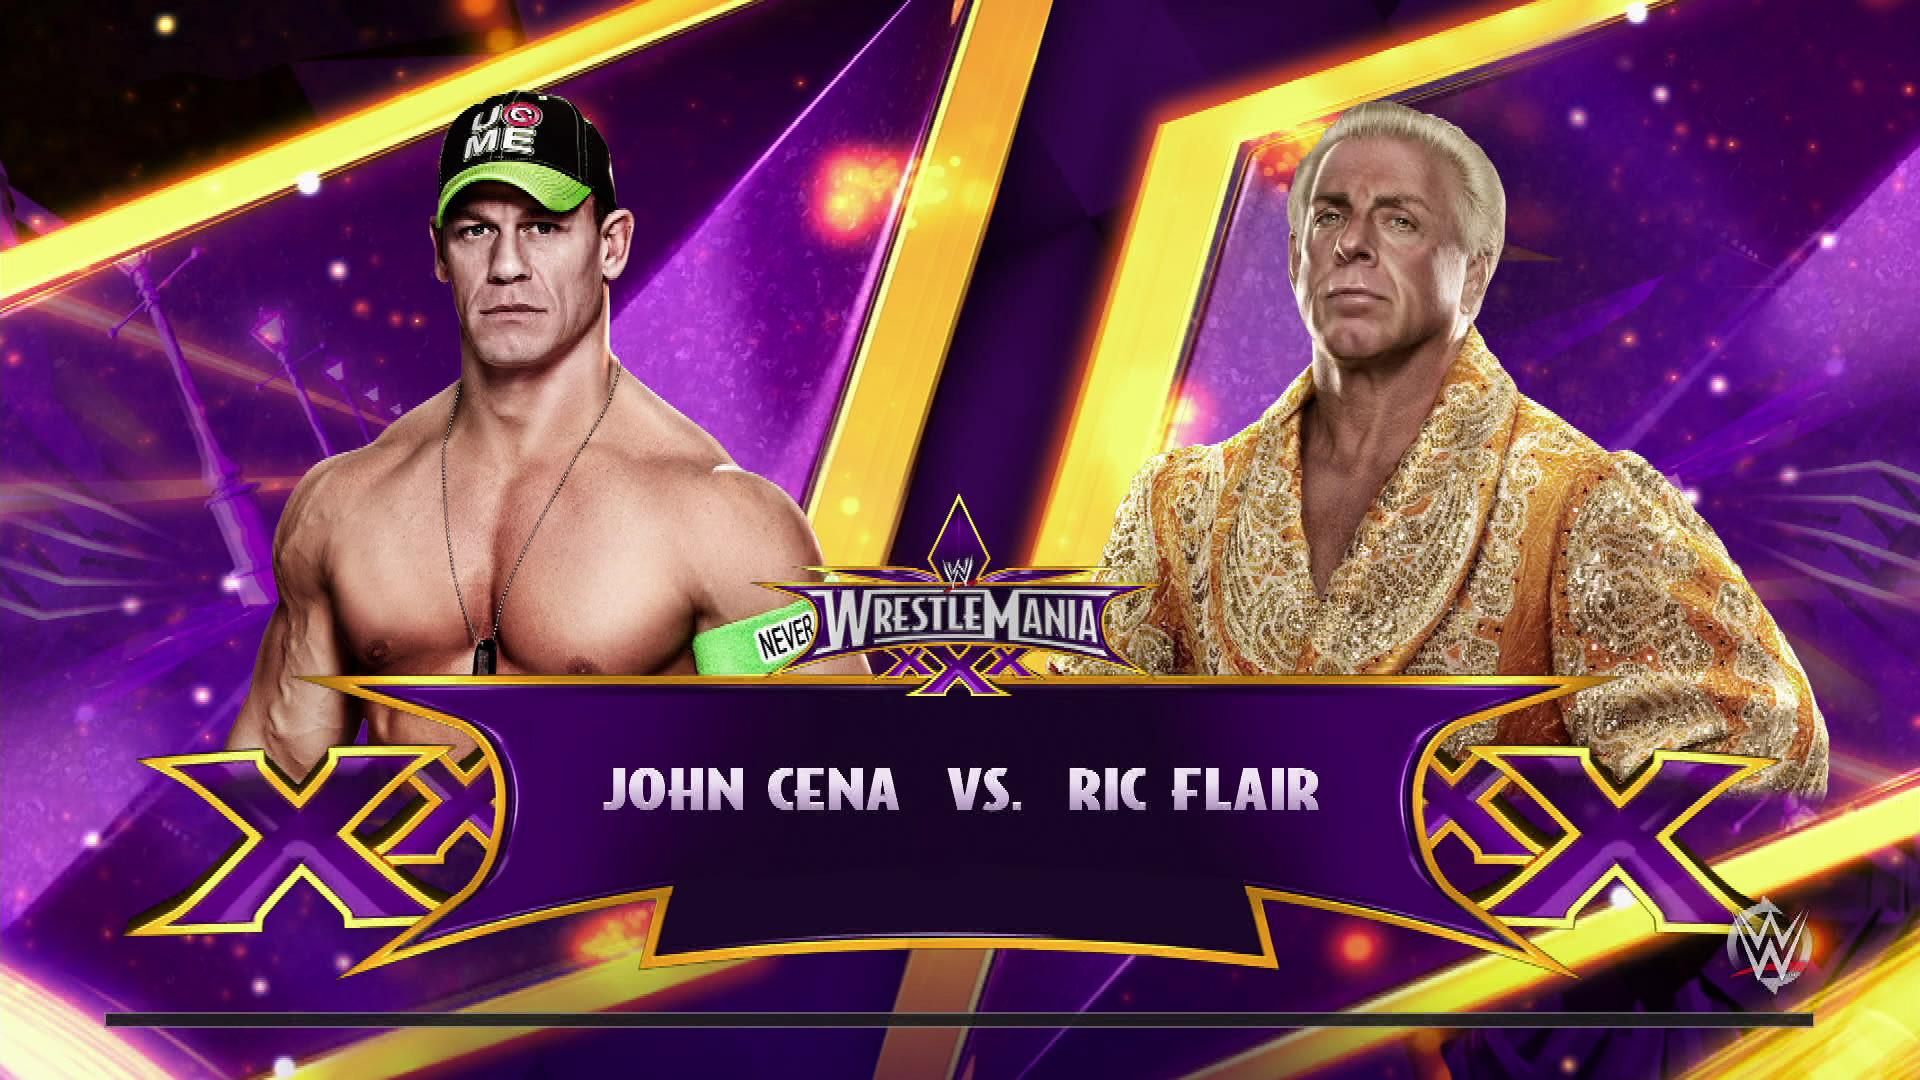 WWE 2K15 How To Unlock Ric Flair